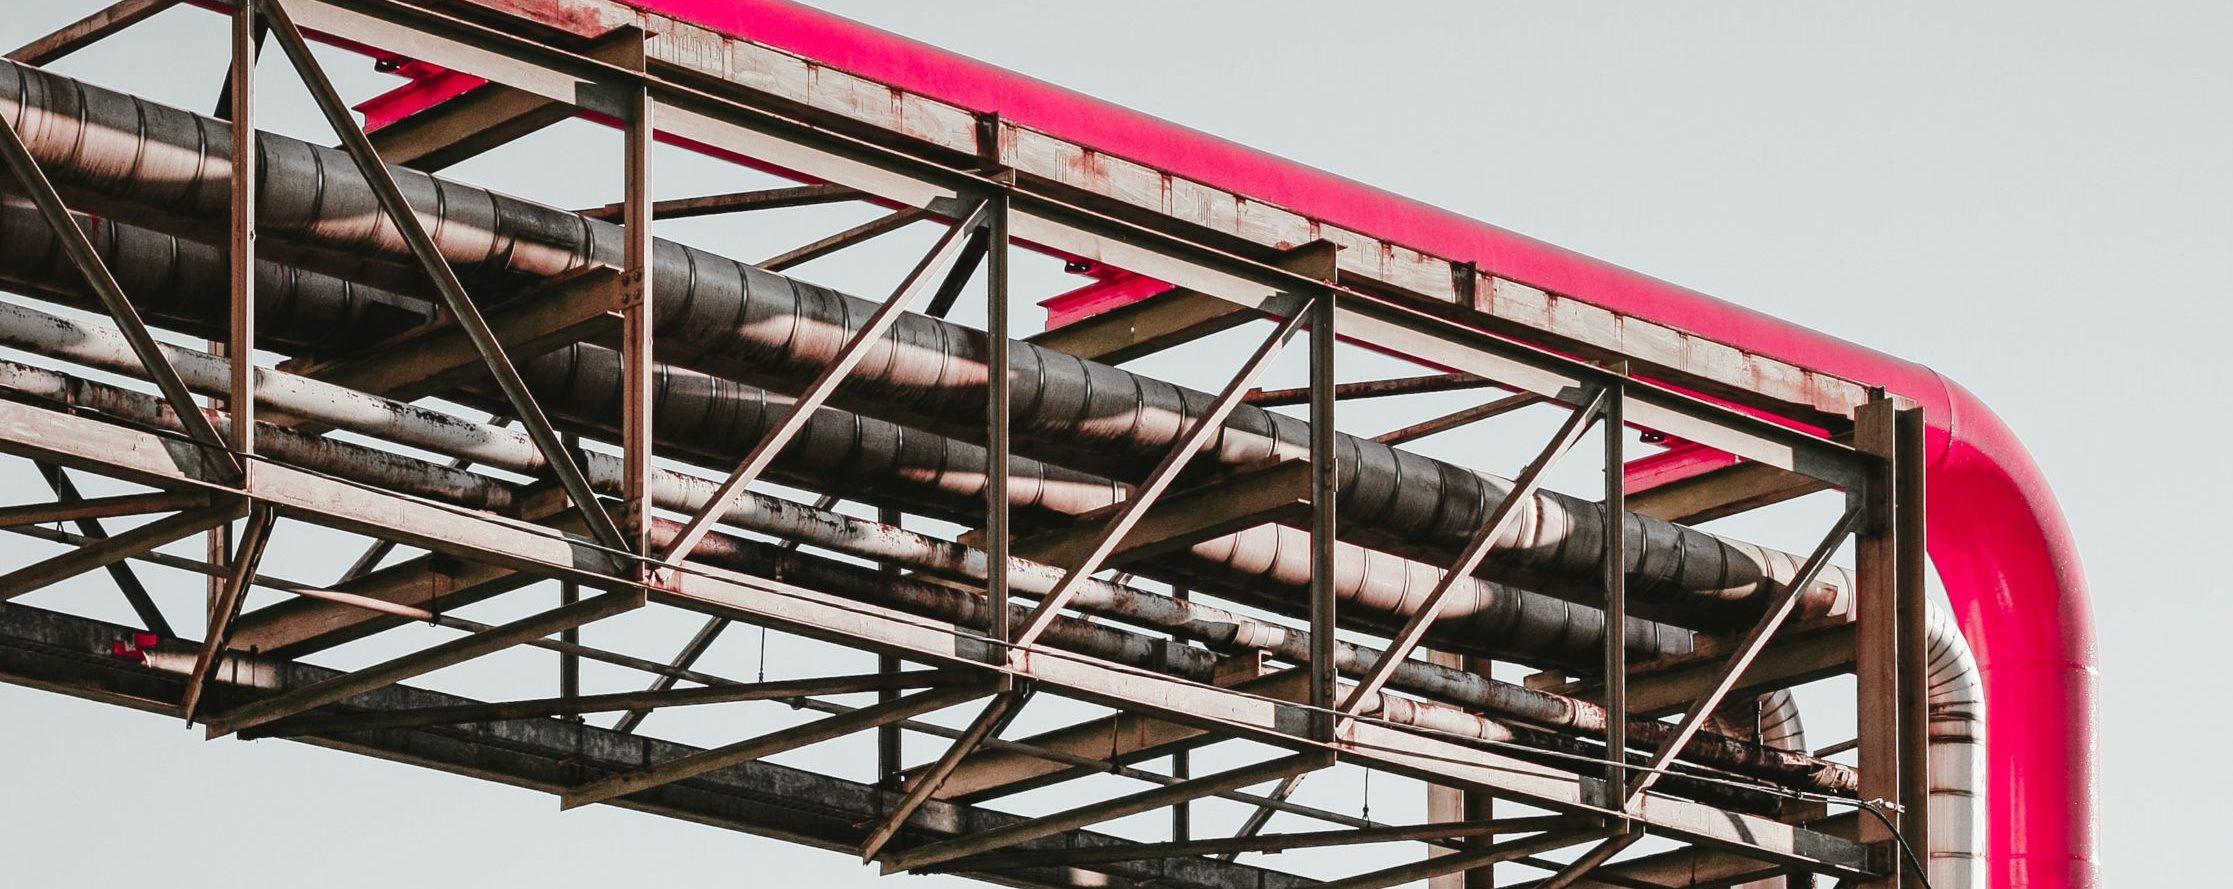 Industrial pipes ©Martin Adams, unsplash.com